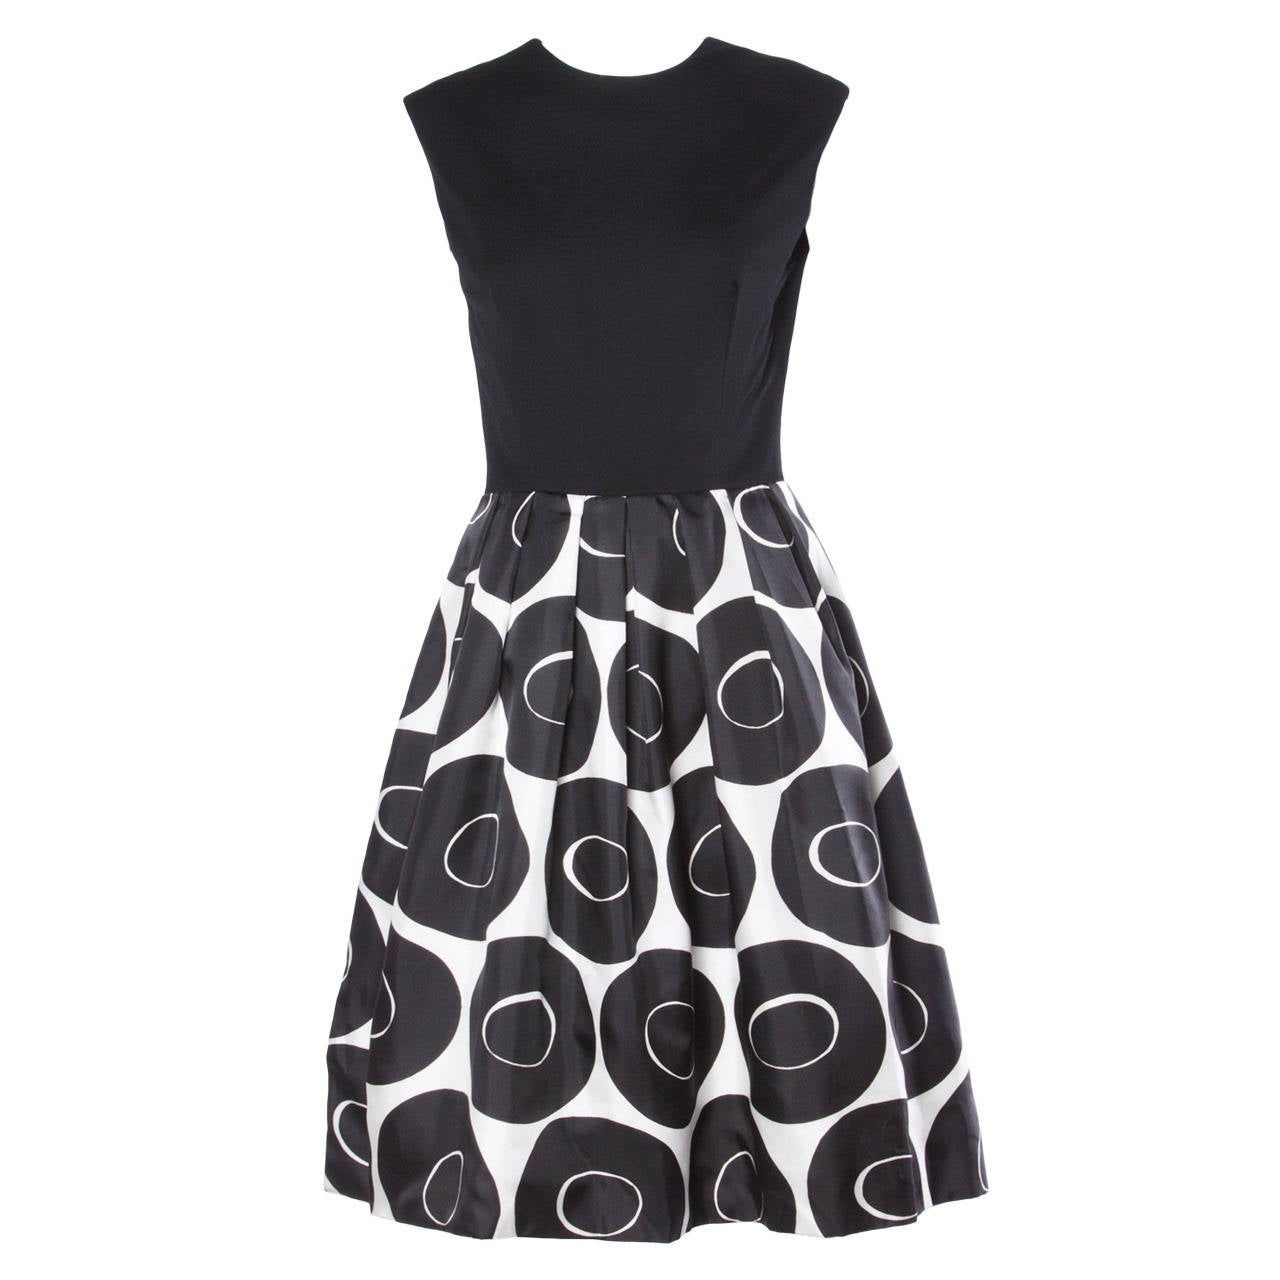 Vintage 1960s Black + White Geometric Print Cocktail Dress 1